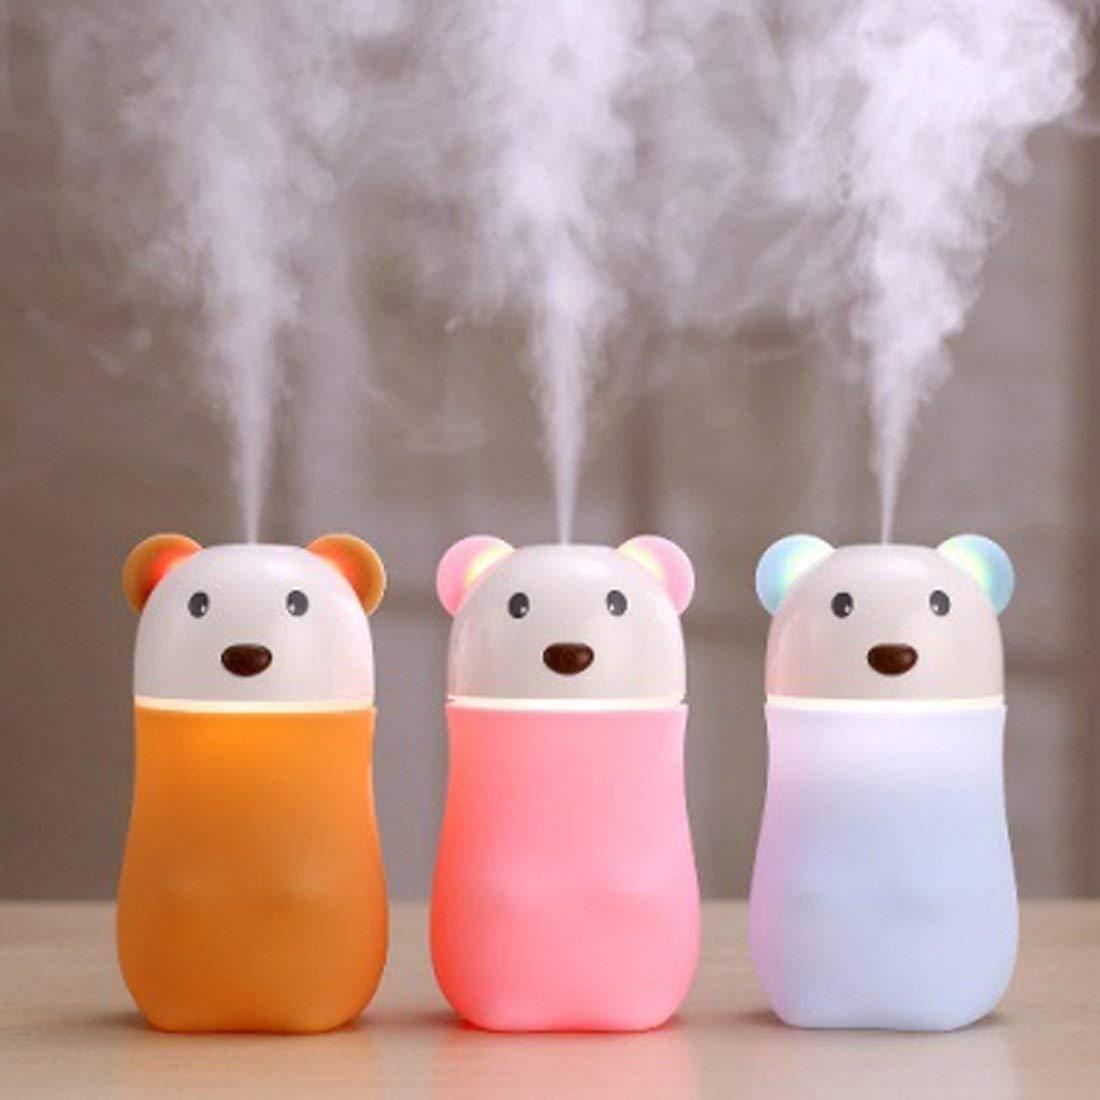 USB Lovely Bear Humidifier, Air Diffuser Freshener with LED Night Light - Unnati Enterprises